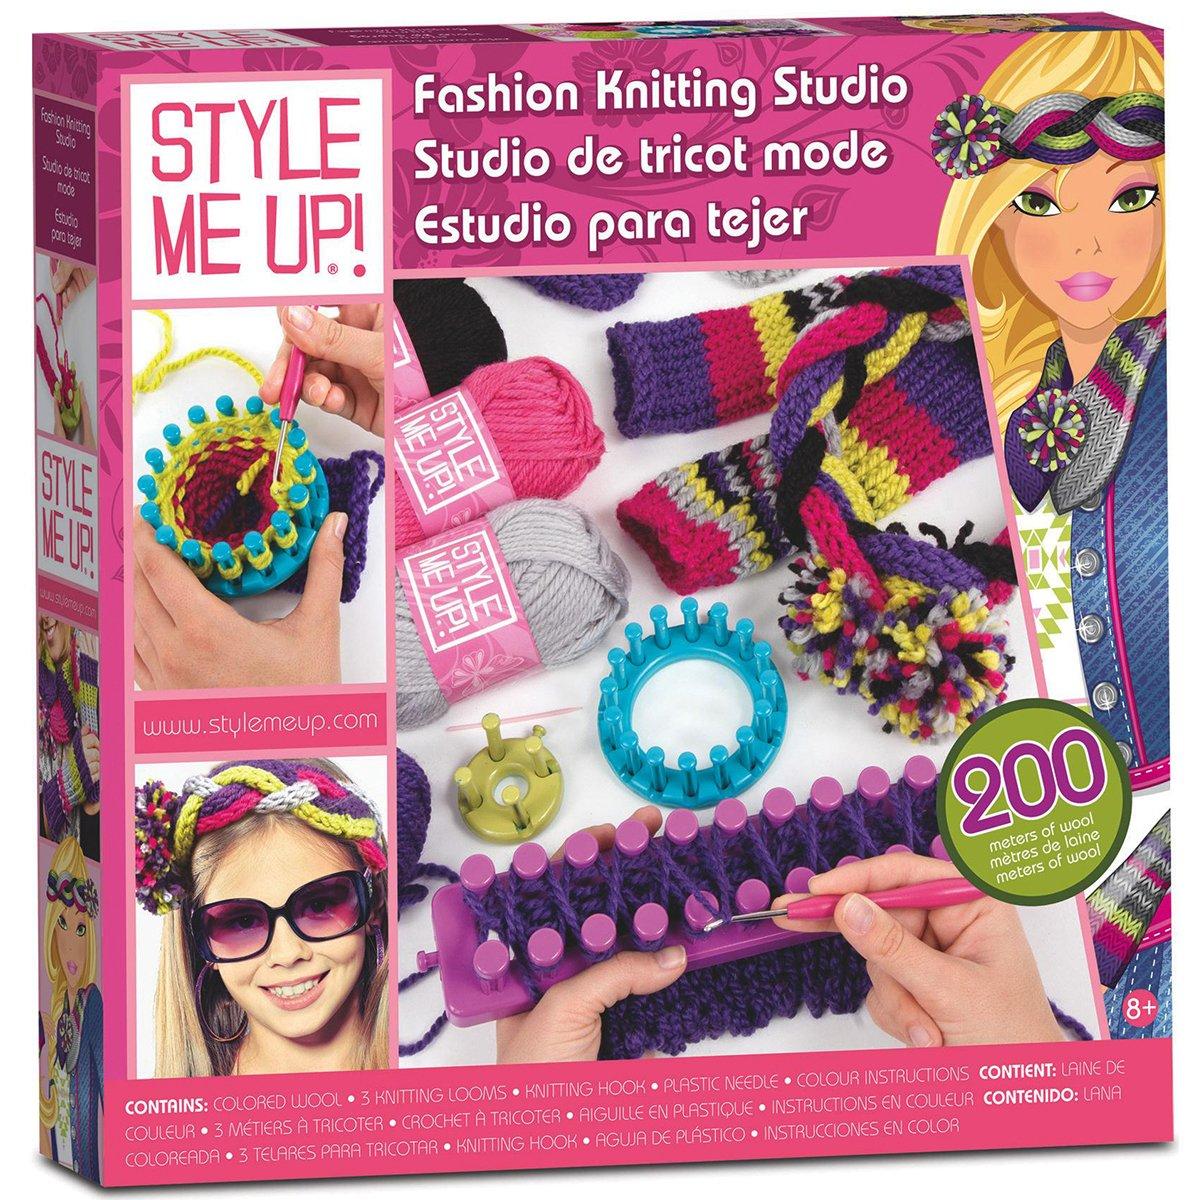 Style Me Up Fashion Knitting Studio